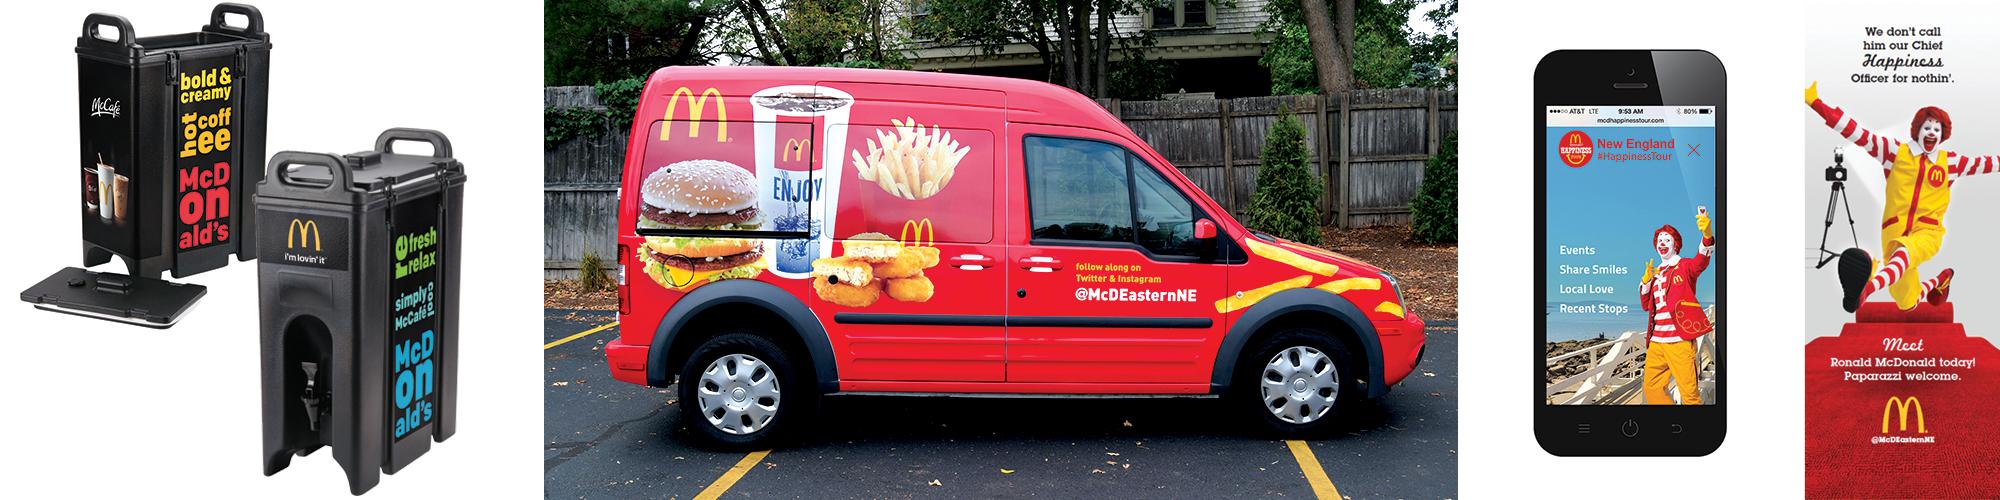 Creative Services McDonalds